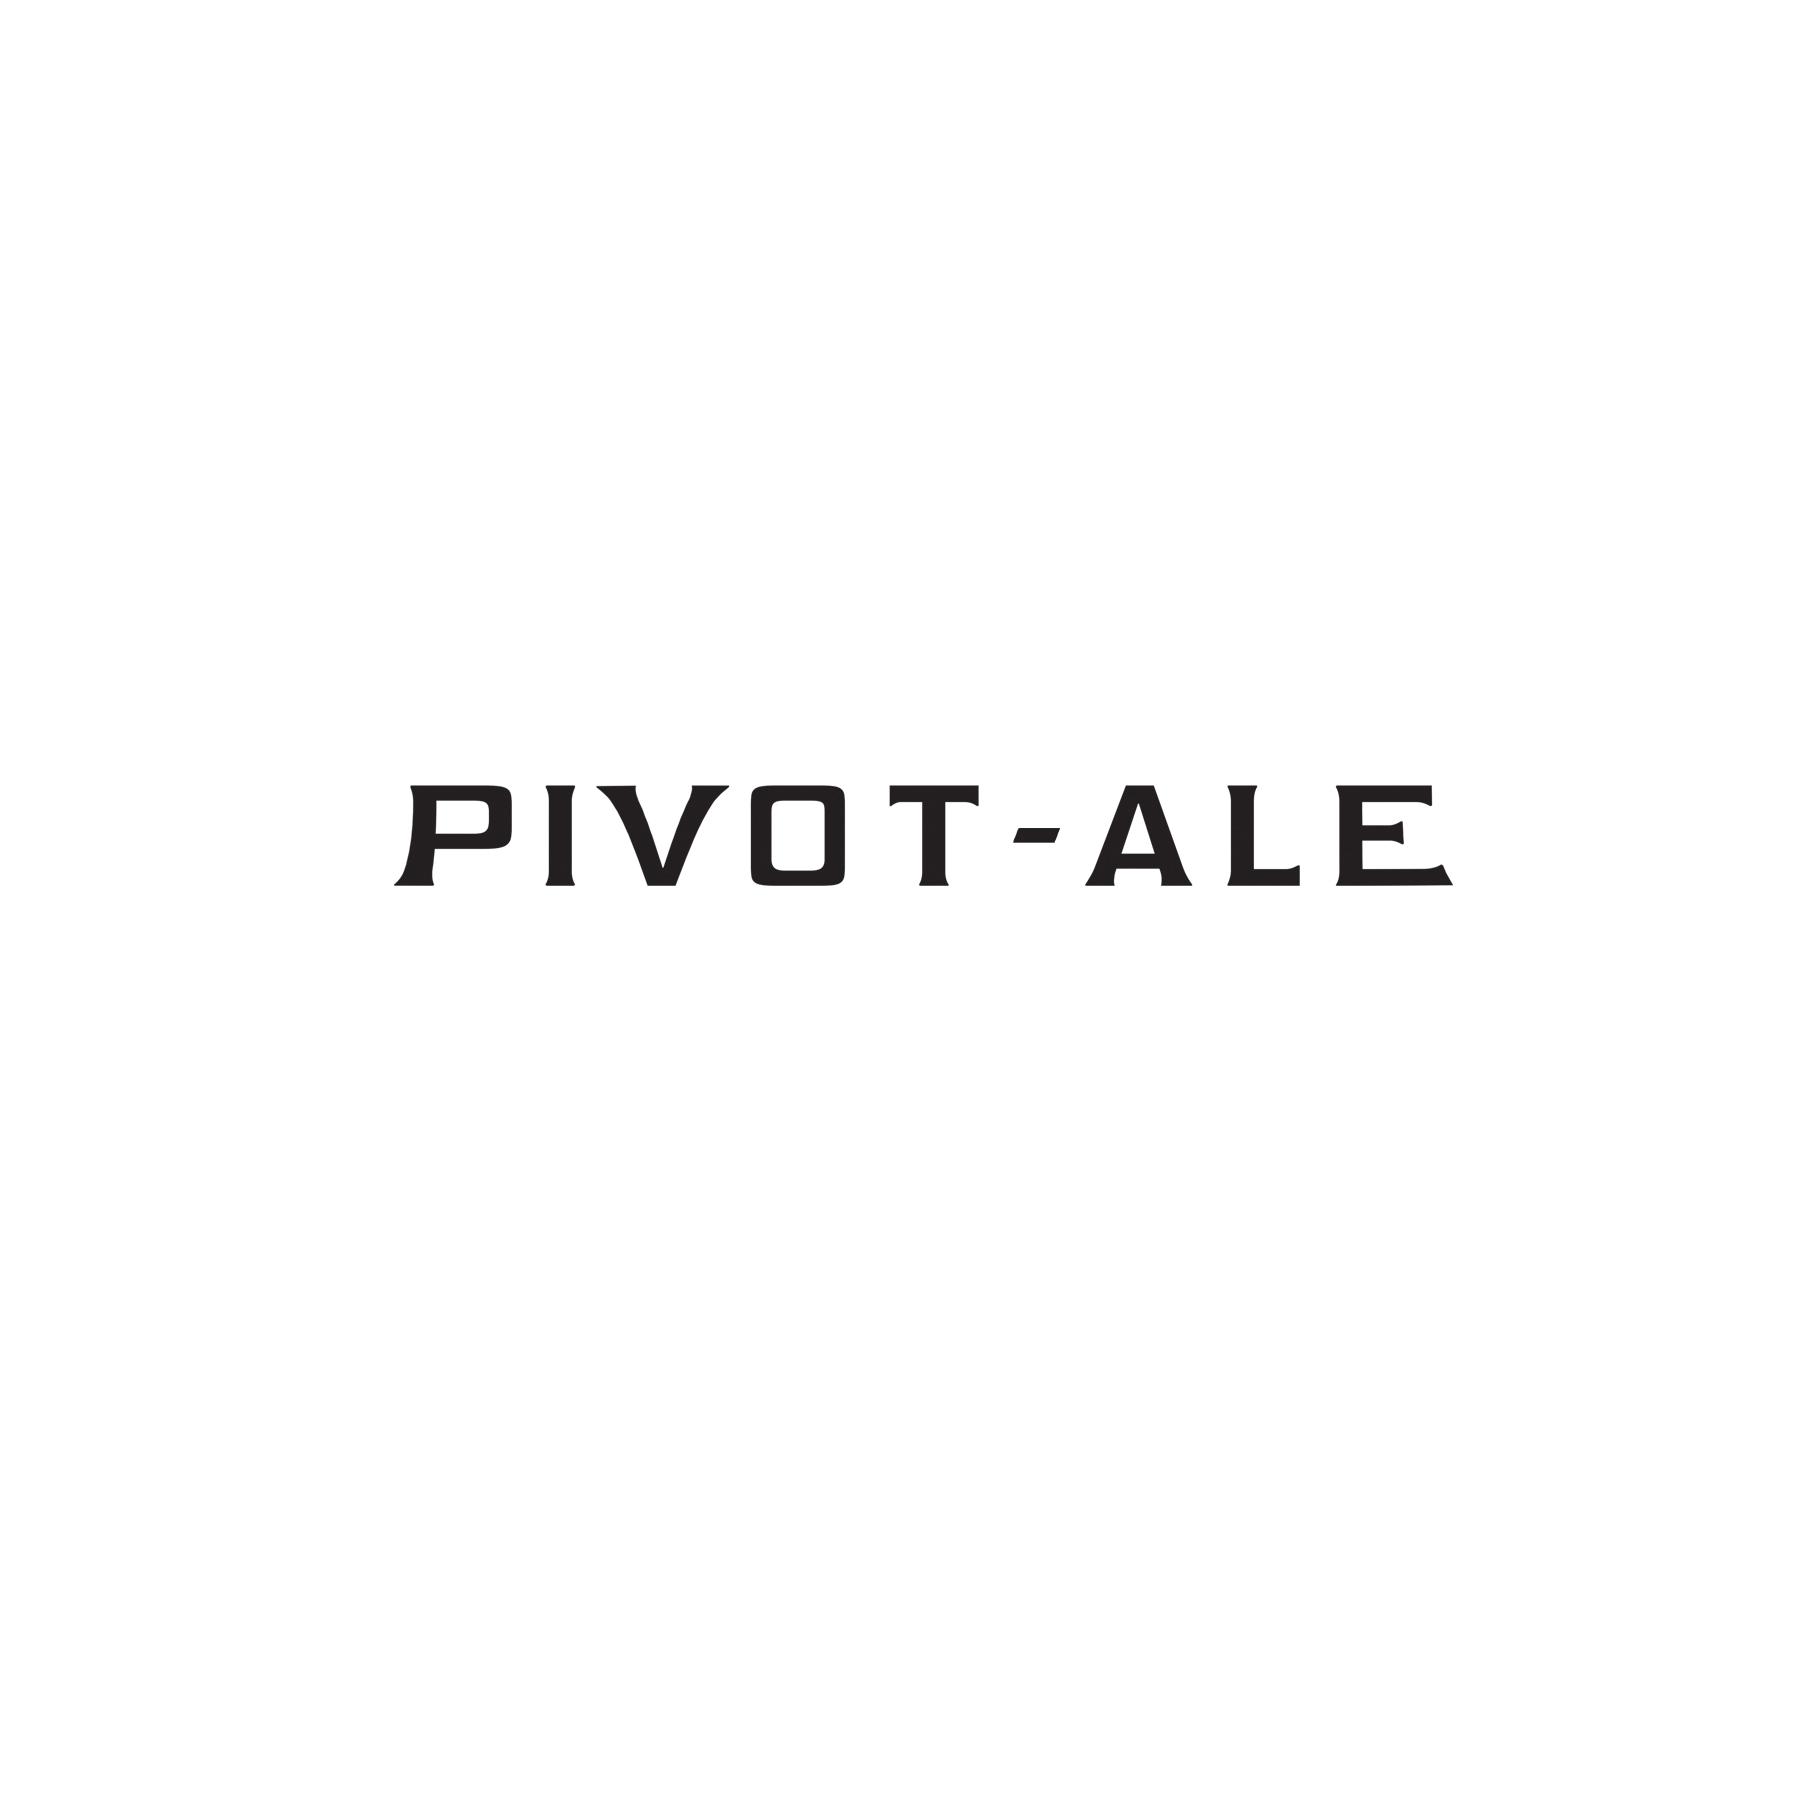 pivot_logo square.jpg